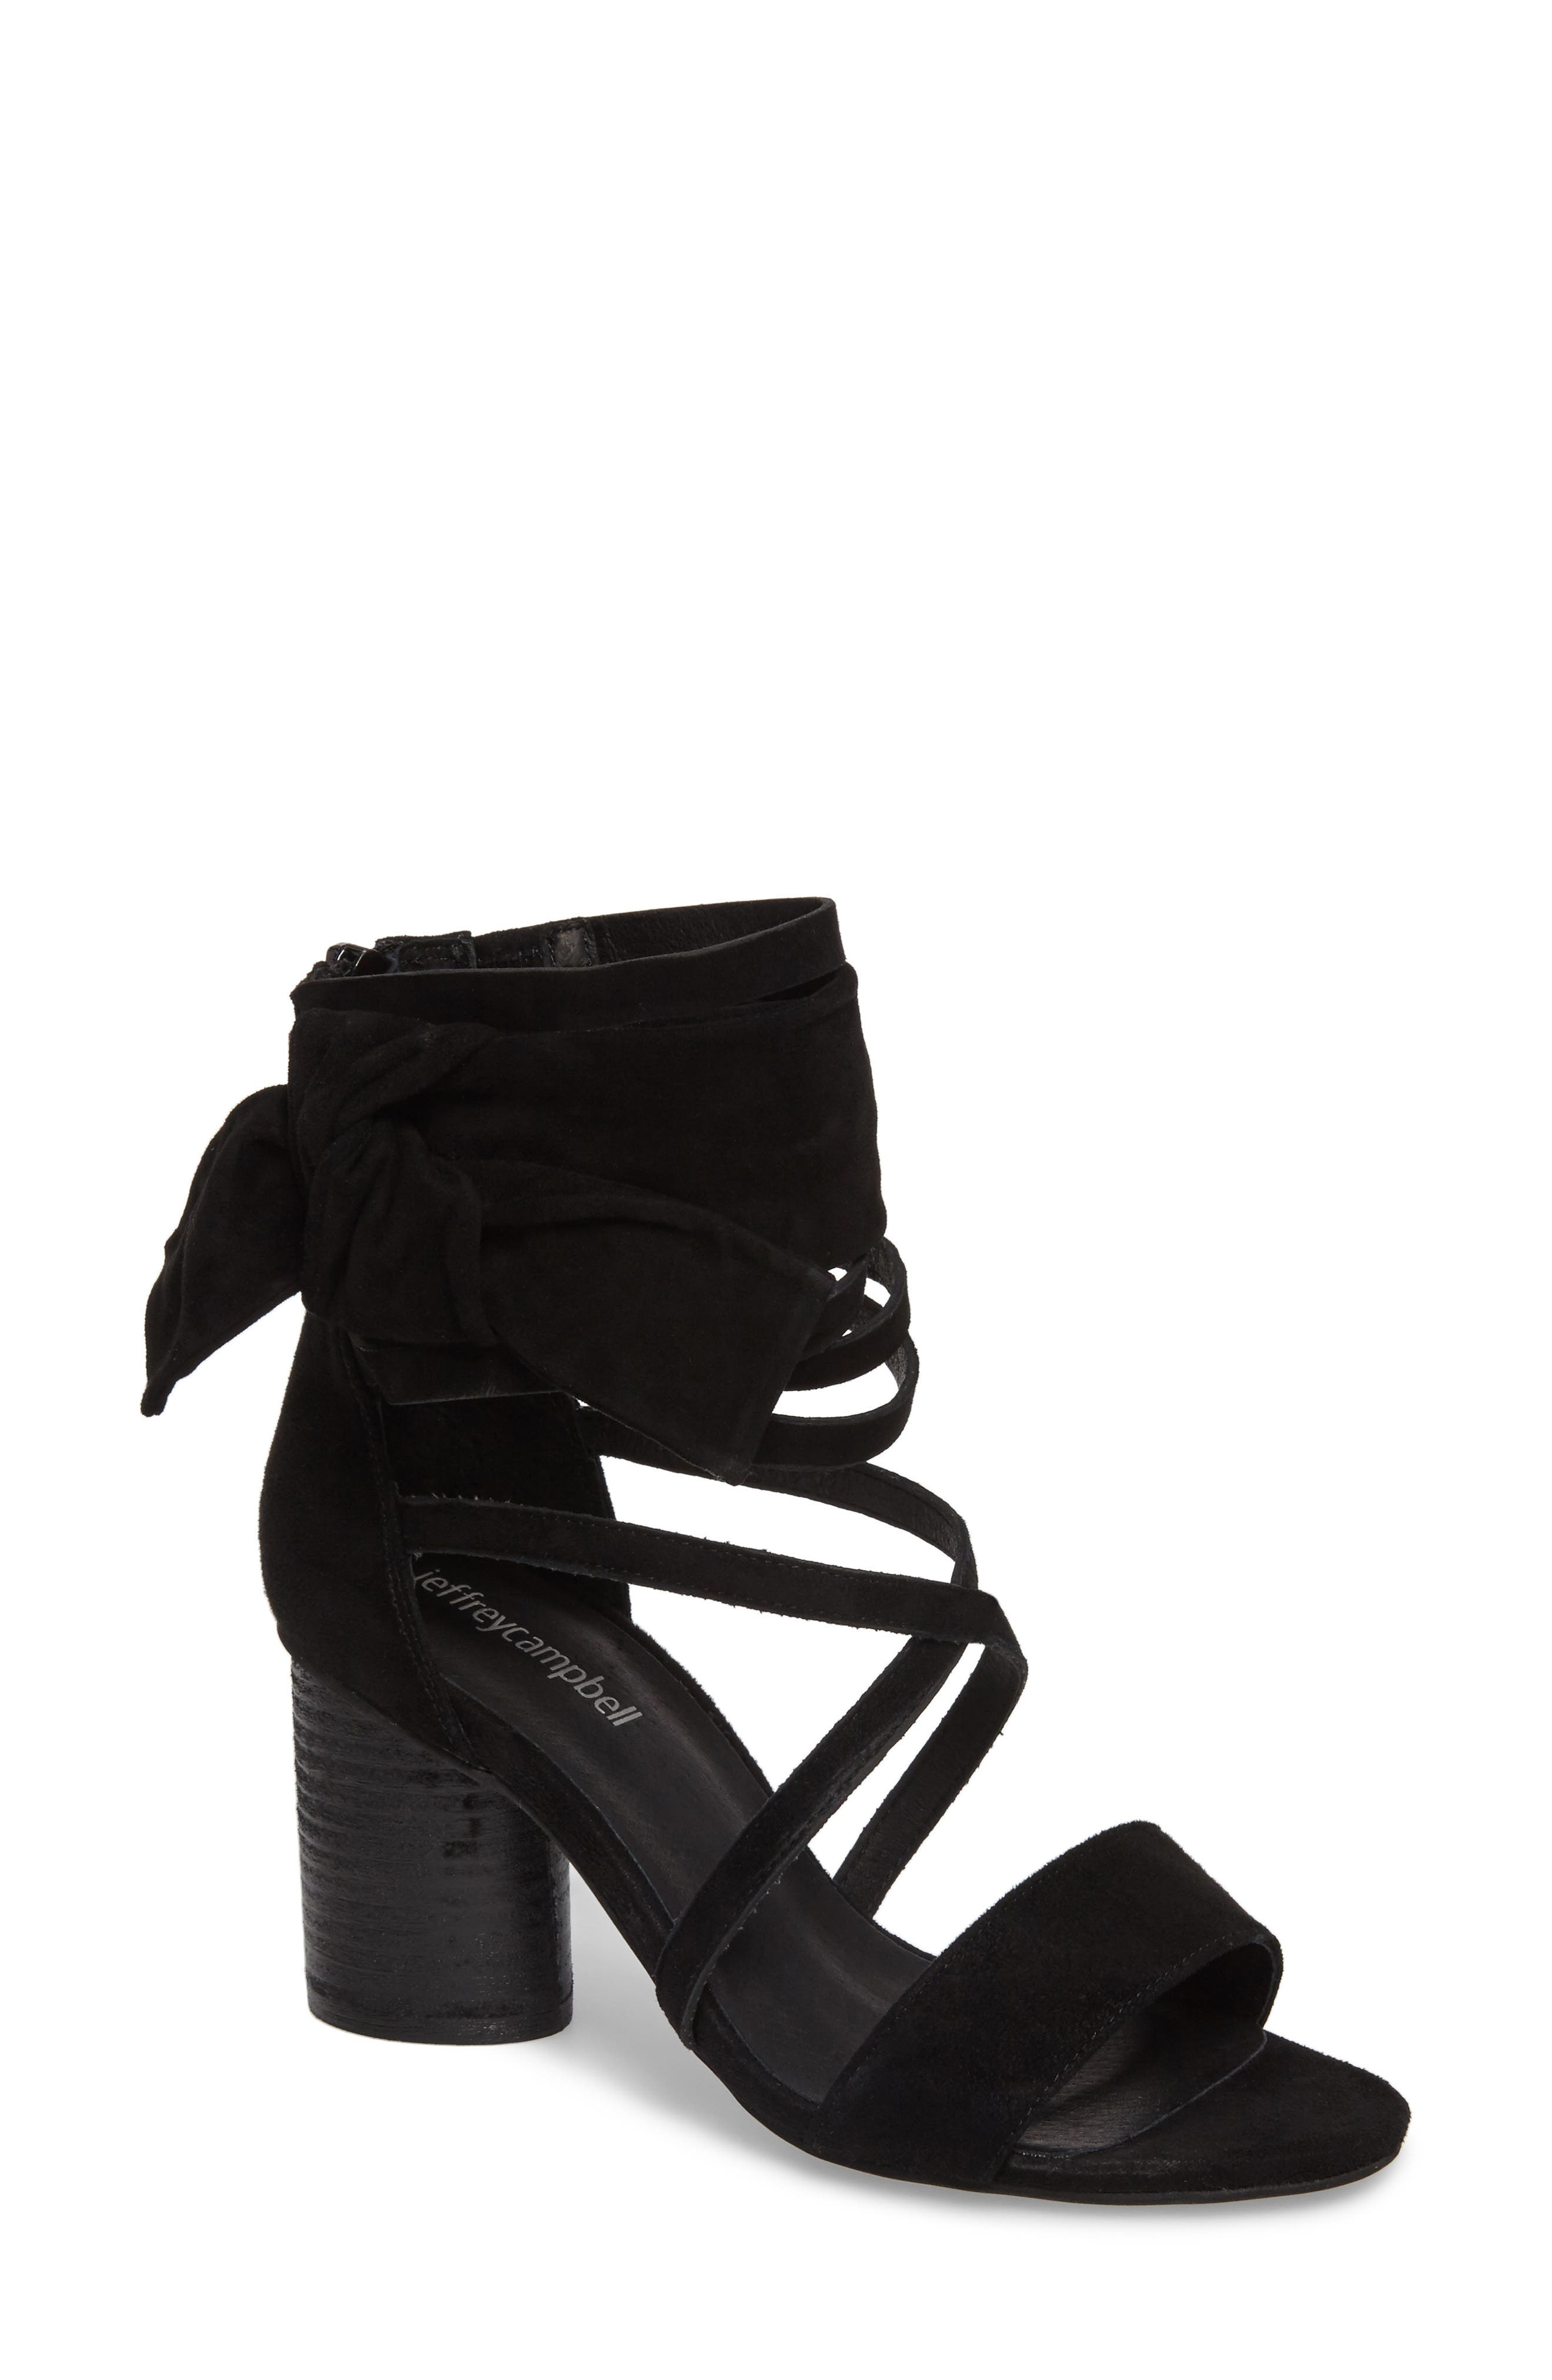 Alternate Image 1 Selected - Jeffrey Campbell Destini Ankle Cuff Sandal (Women)